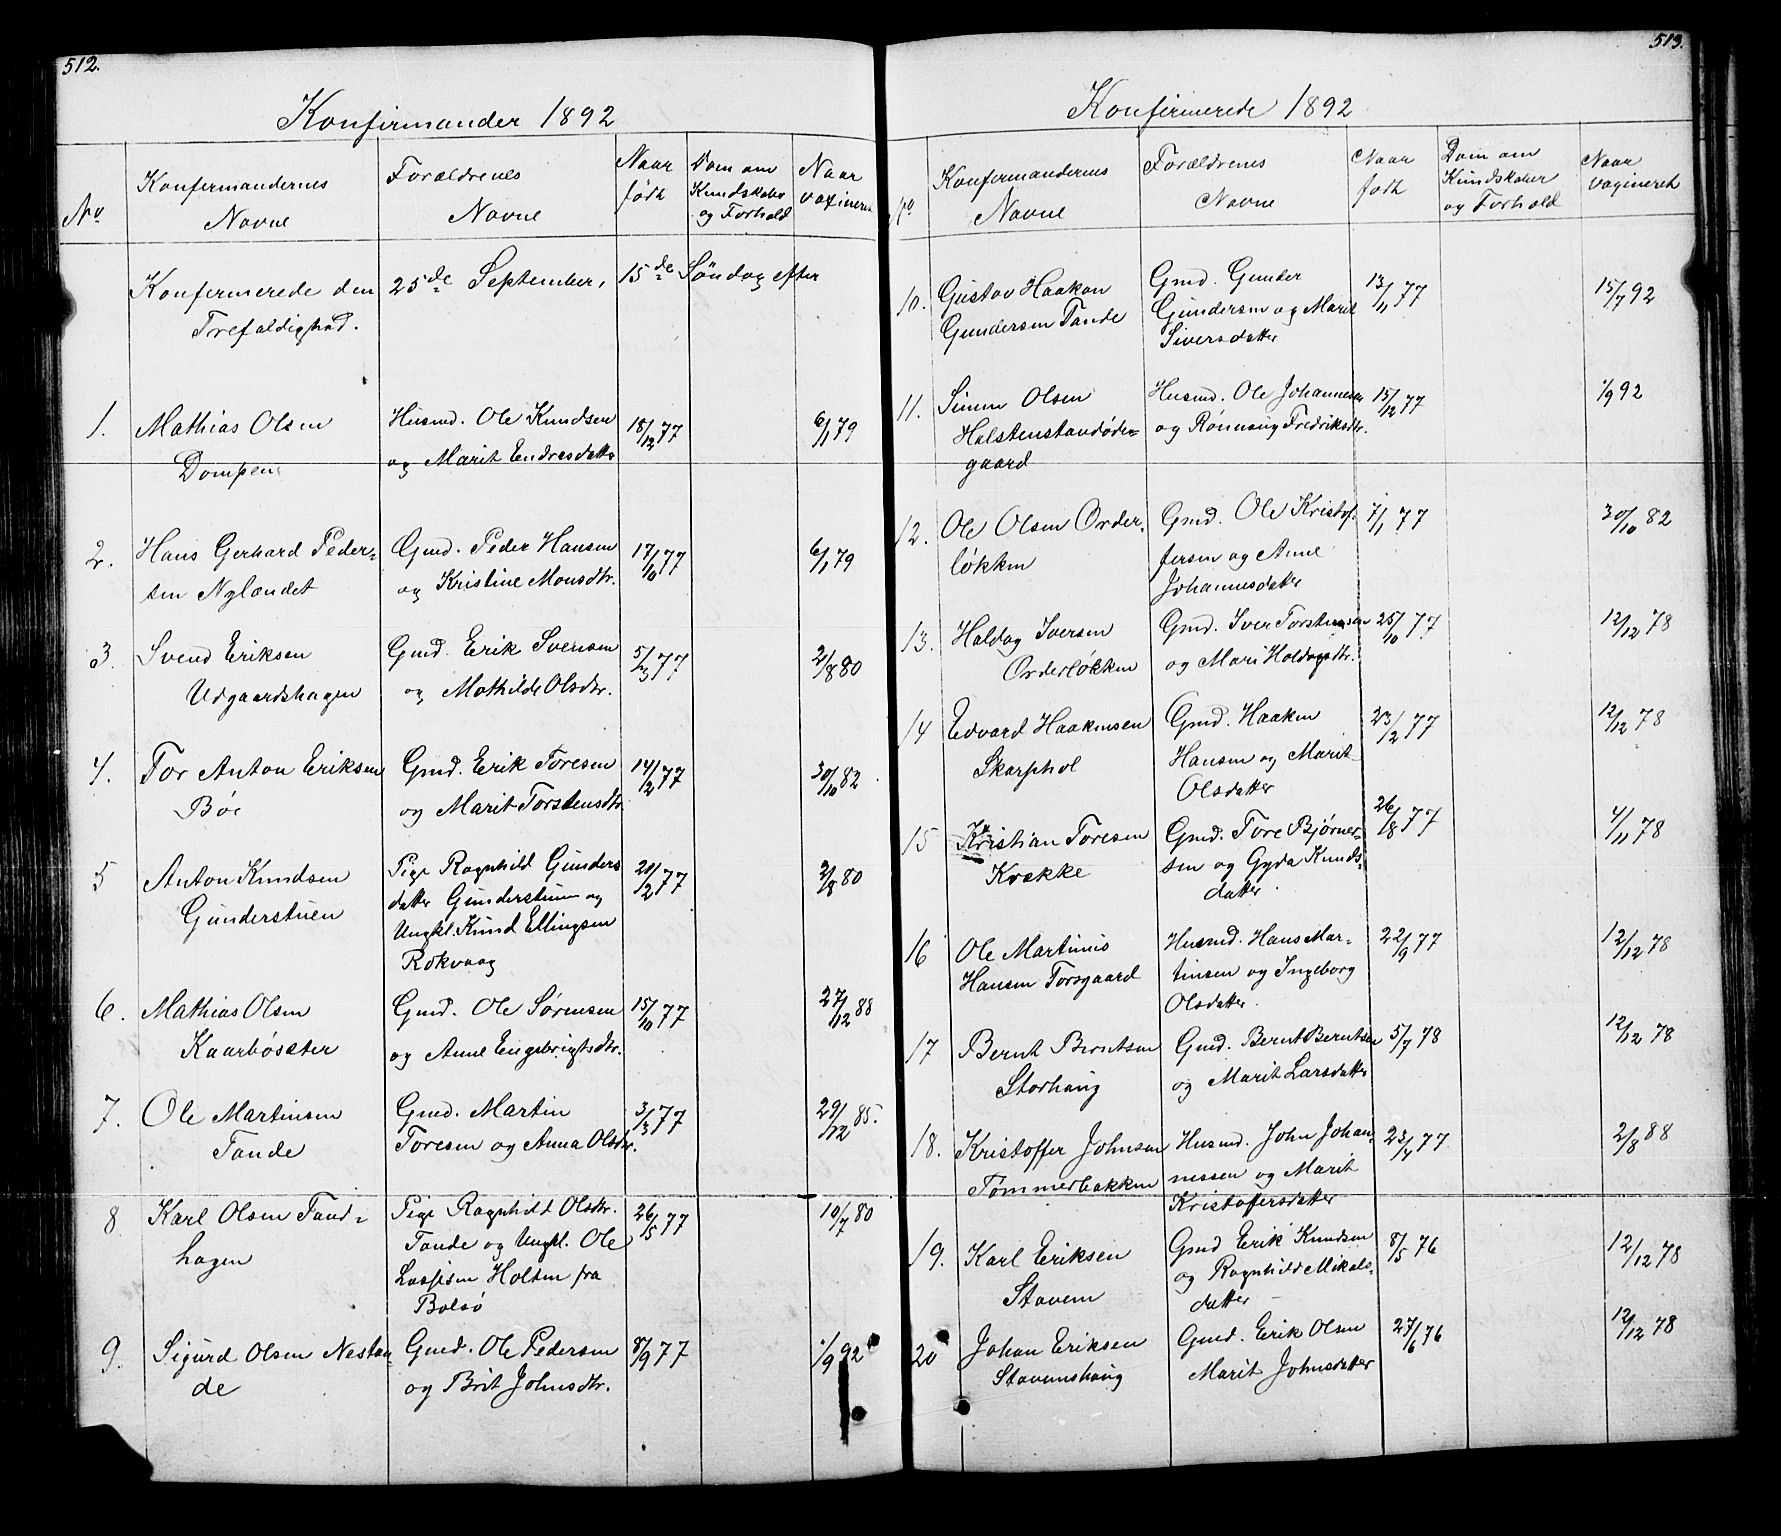 SAH, Lesja prestekontor, Klokkerbok nr. 5, 1850-1894, s. 512-513